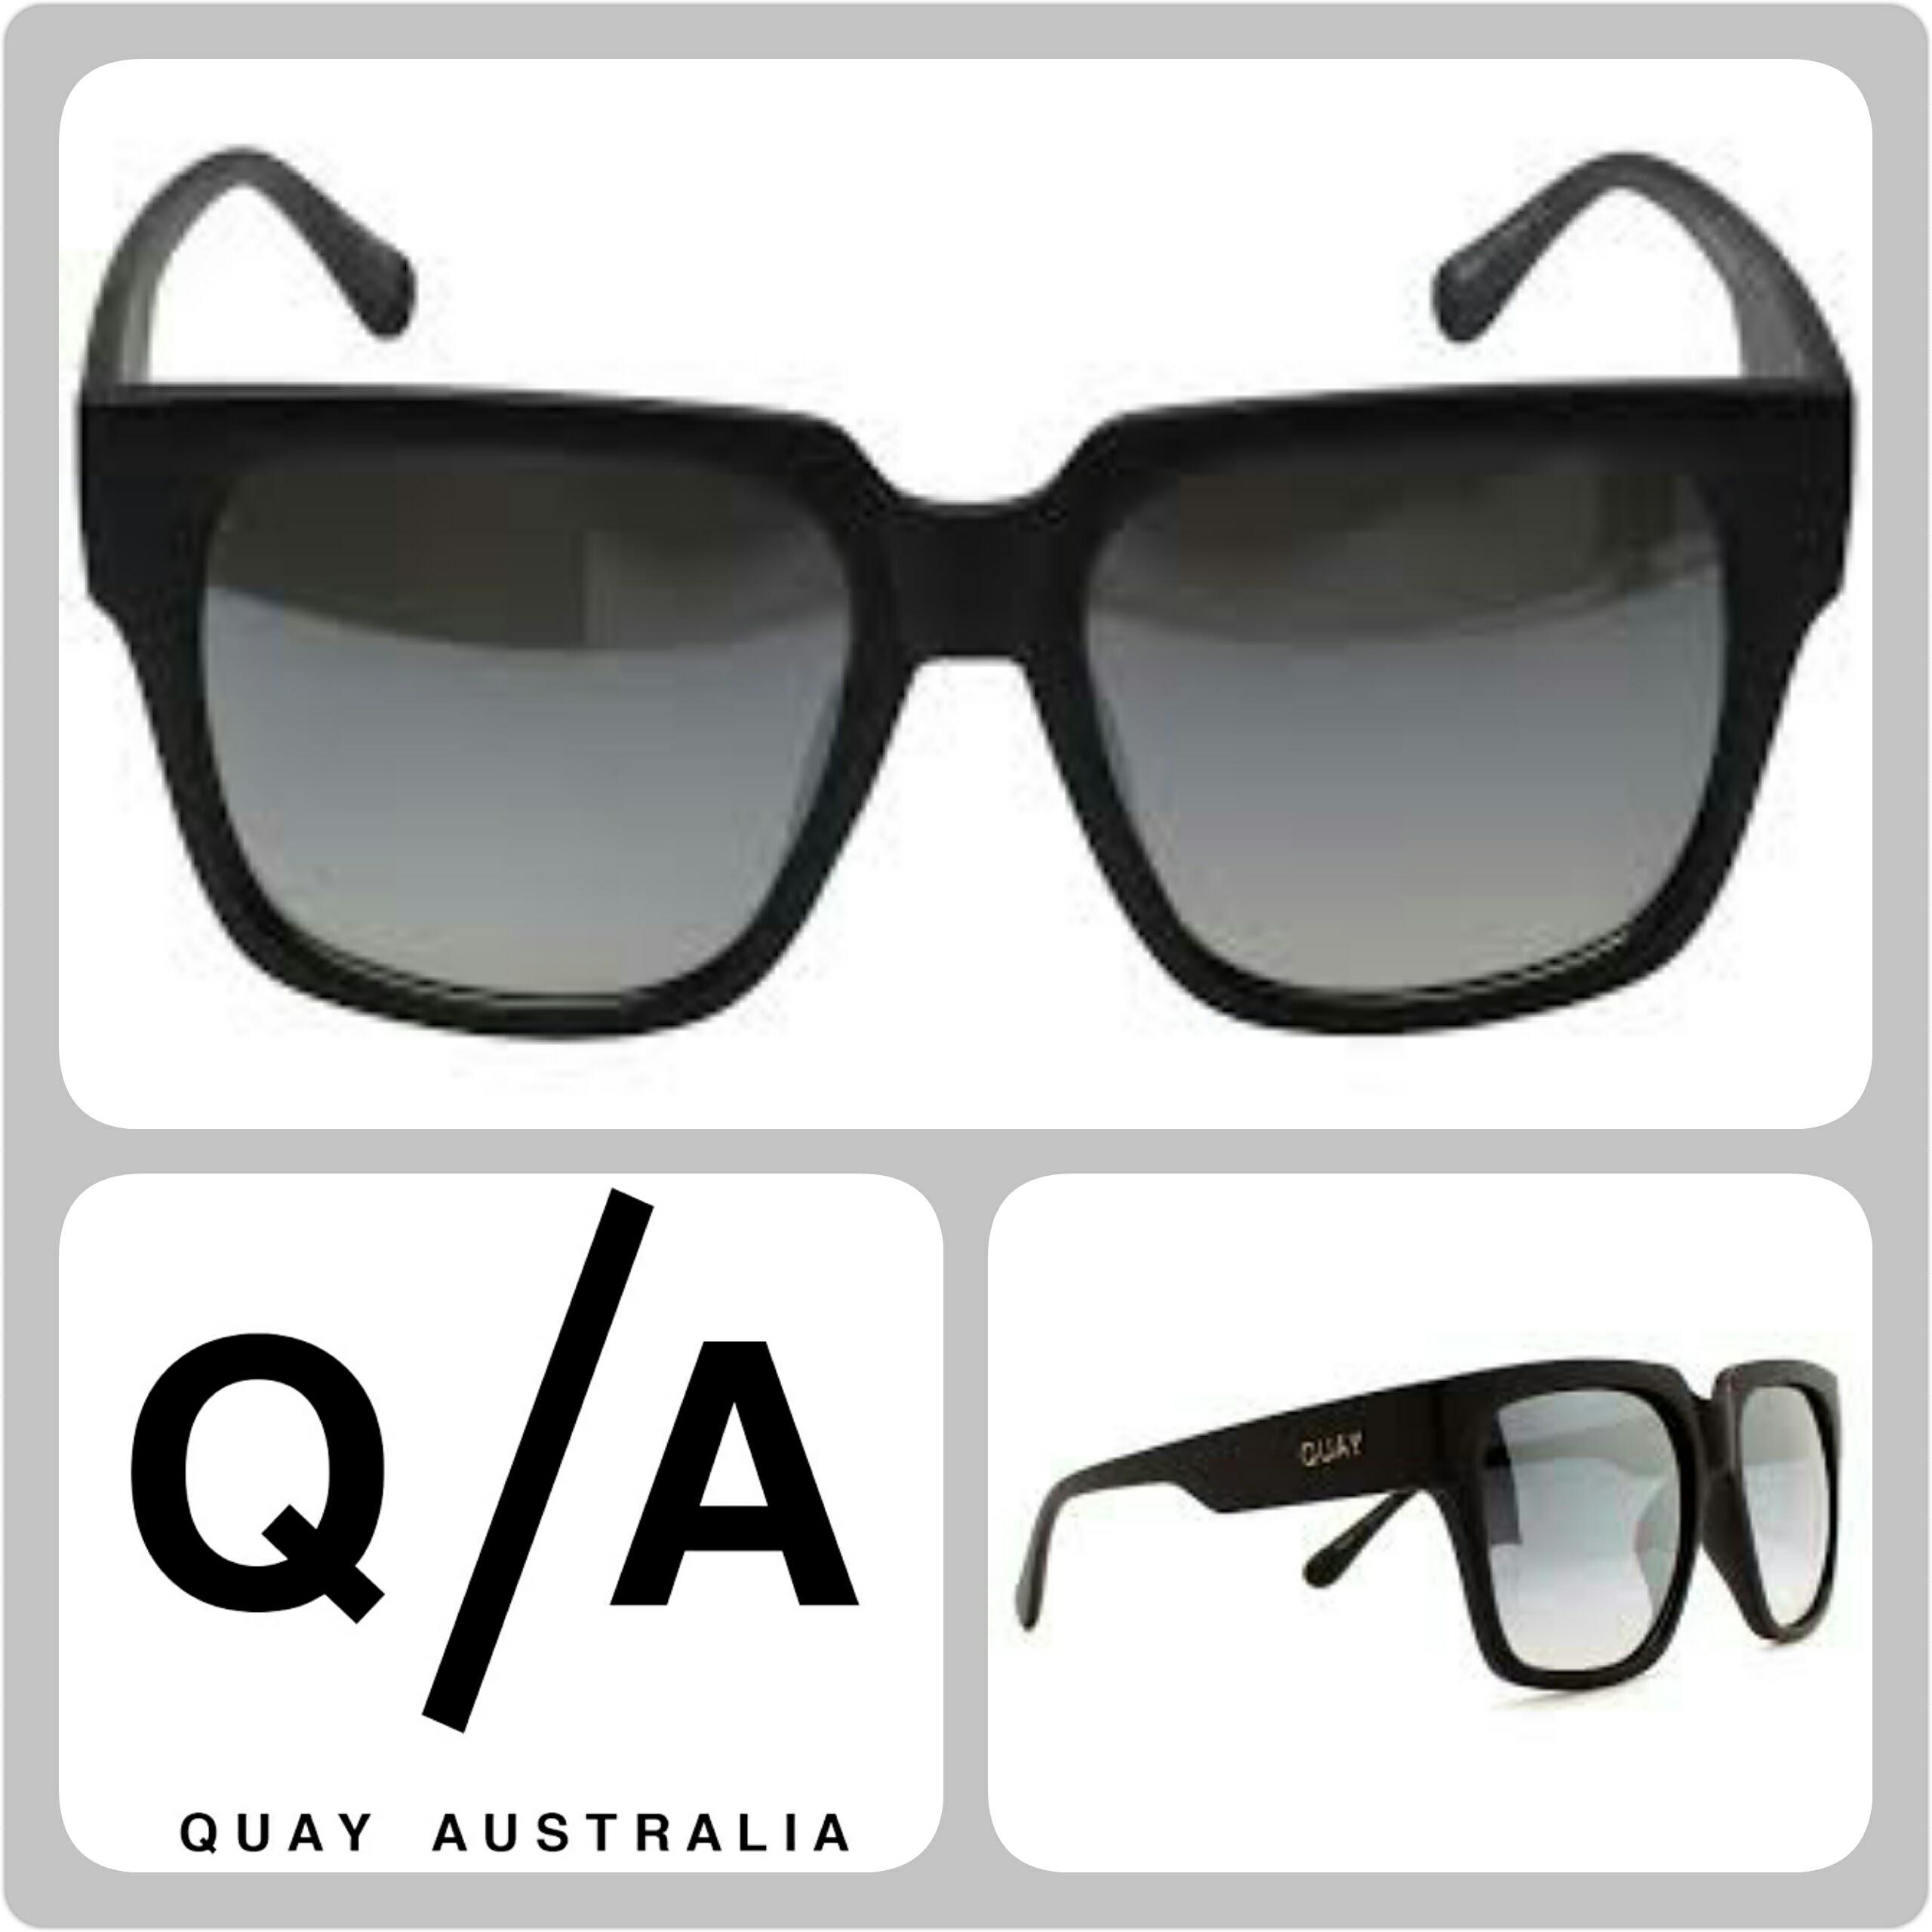 bffc060f31519 Quay Australia